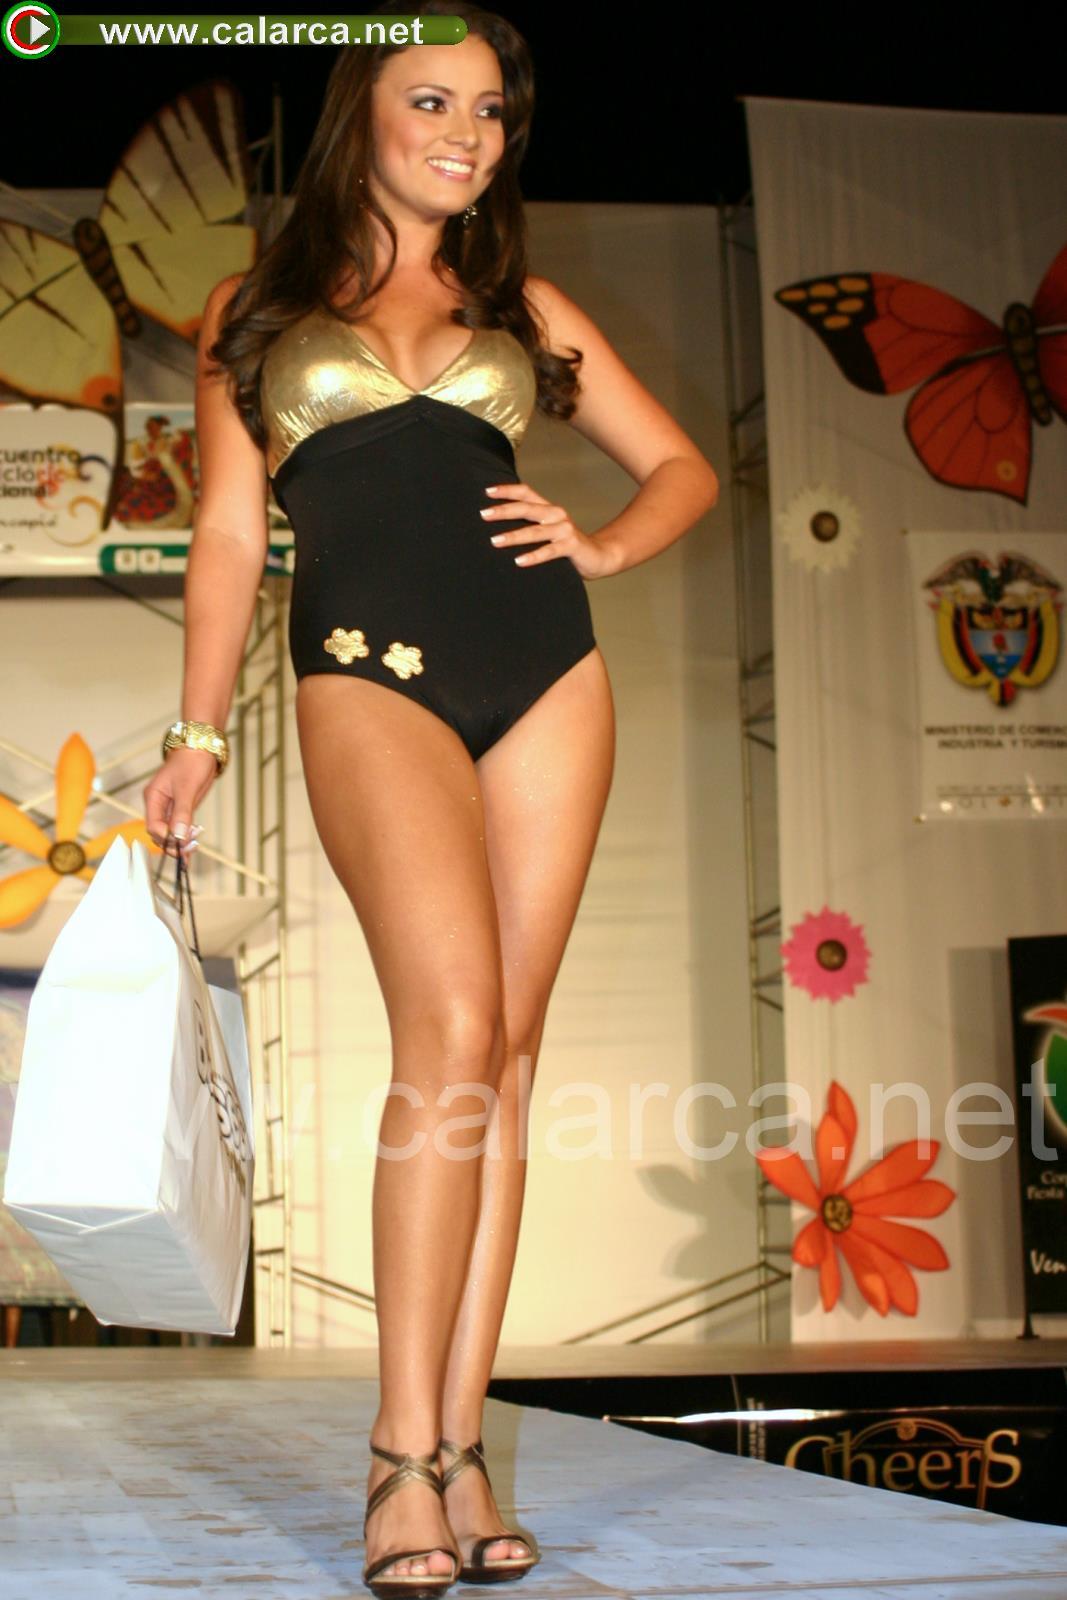 Risaralda - Andrea Marcela Agudelo Ramírez